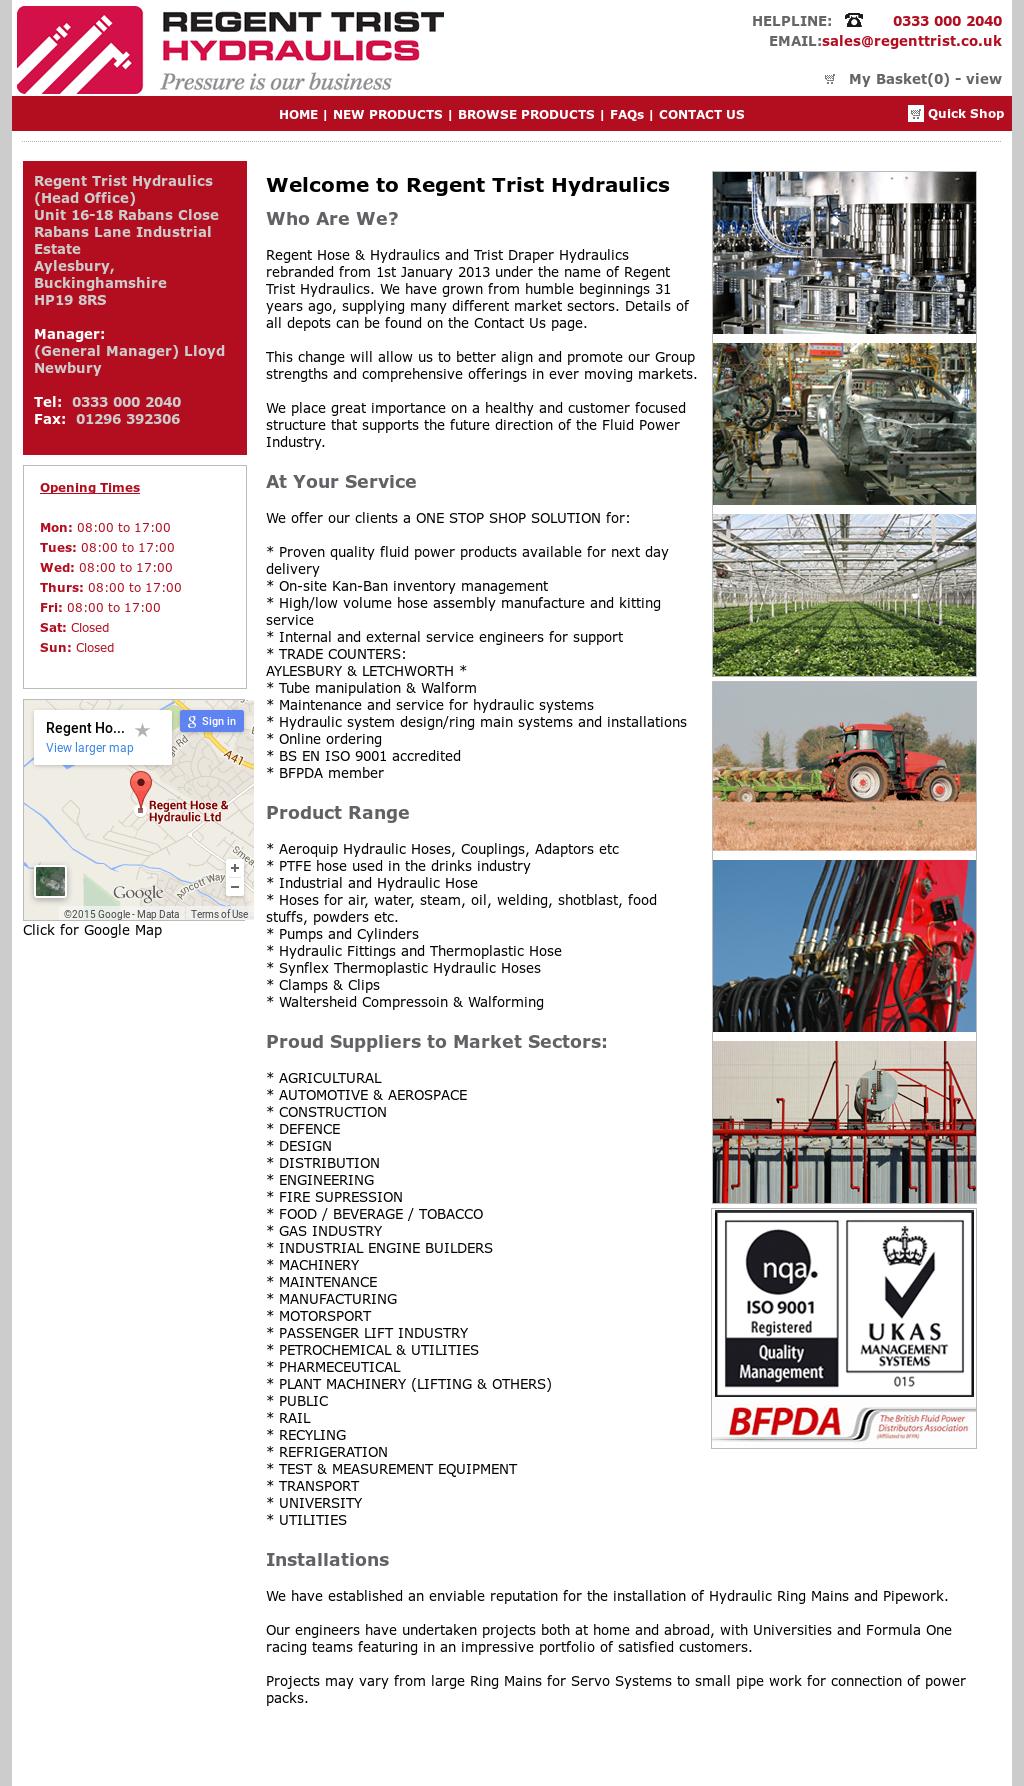 Regent Trist Draper Hose & Hydraulics Competitors, Revenue